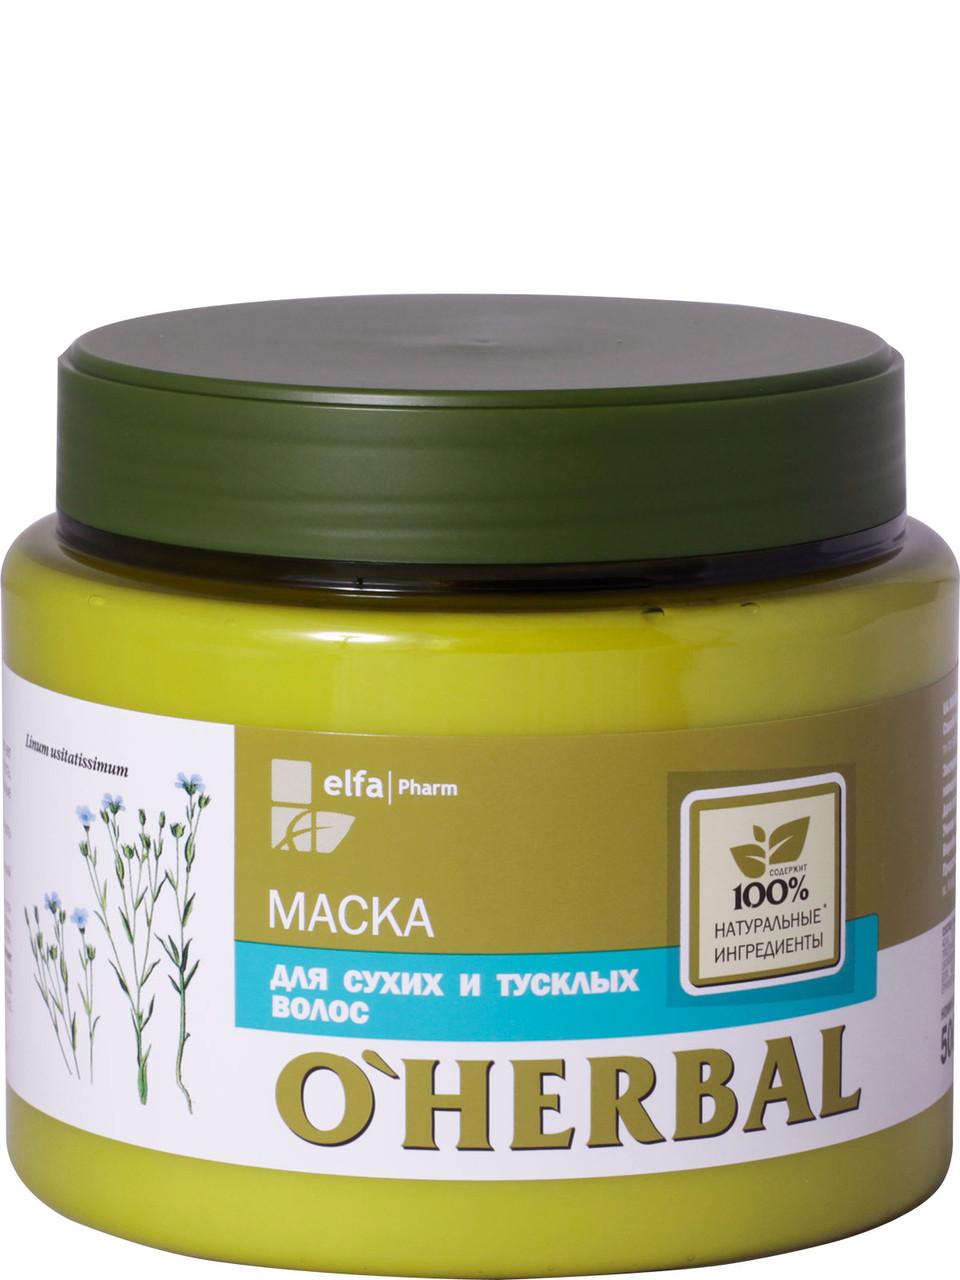 O'Herbal Маска для сухих и тусклых волос 500мл